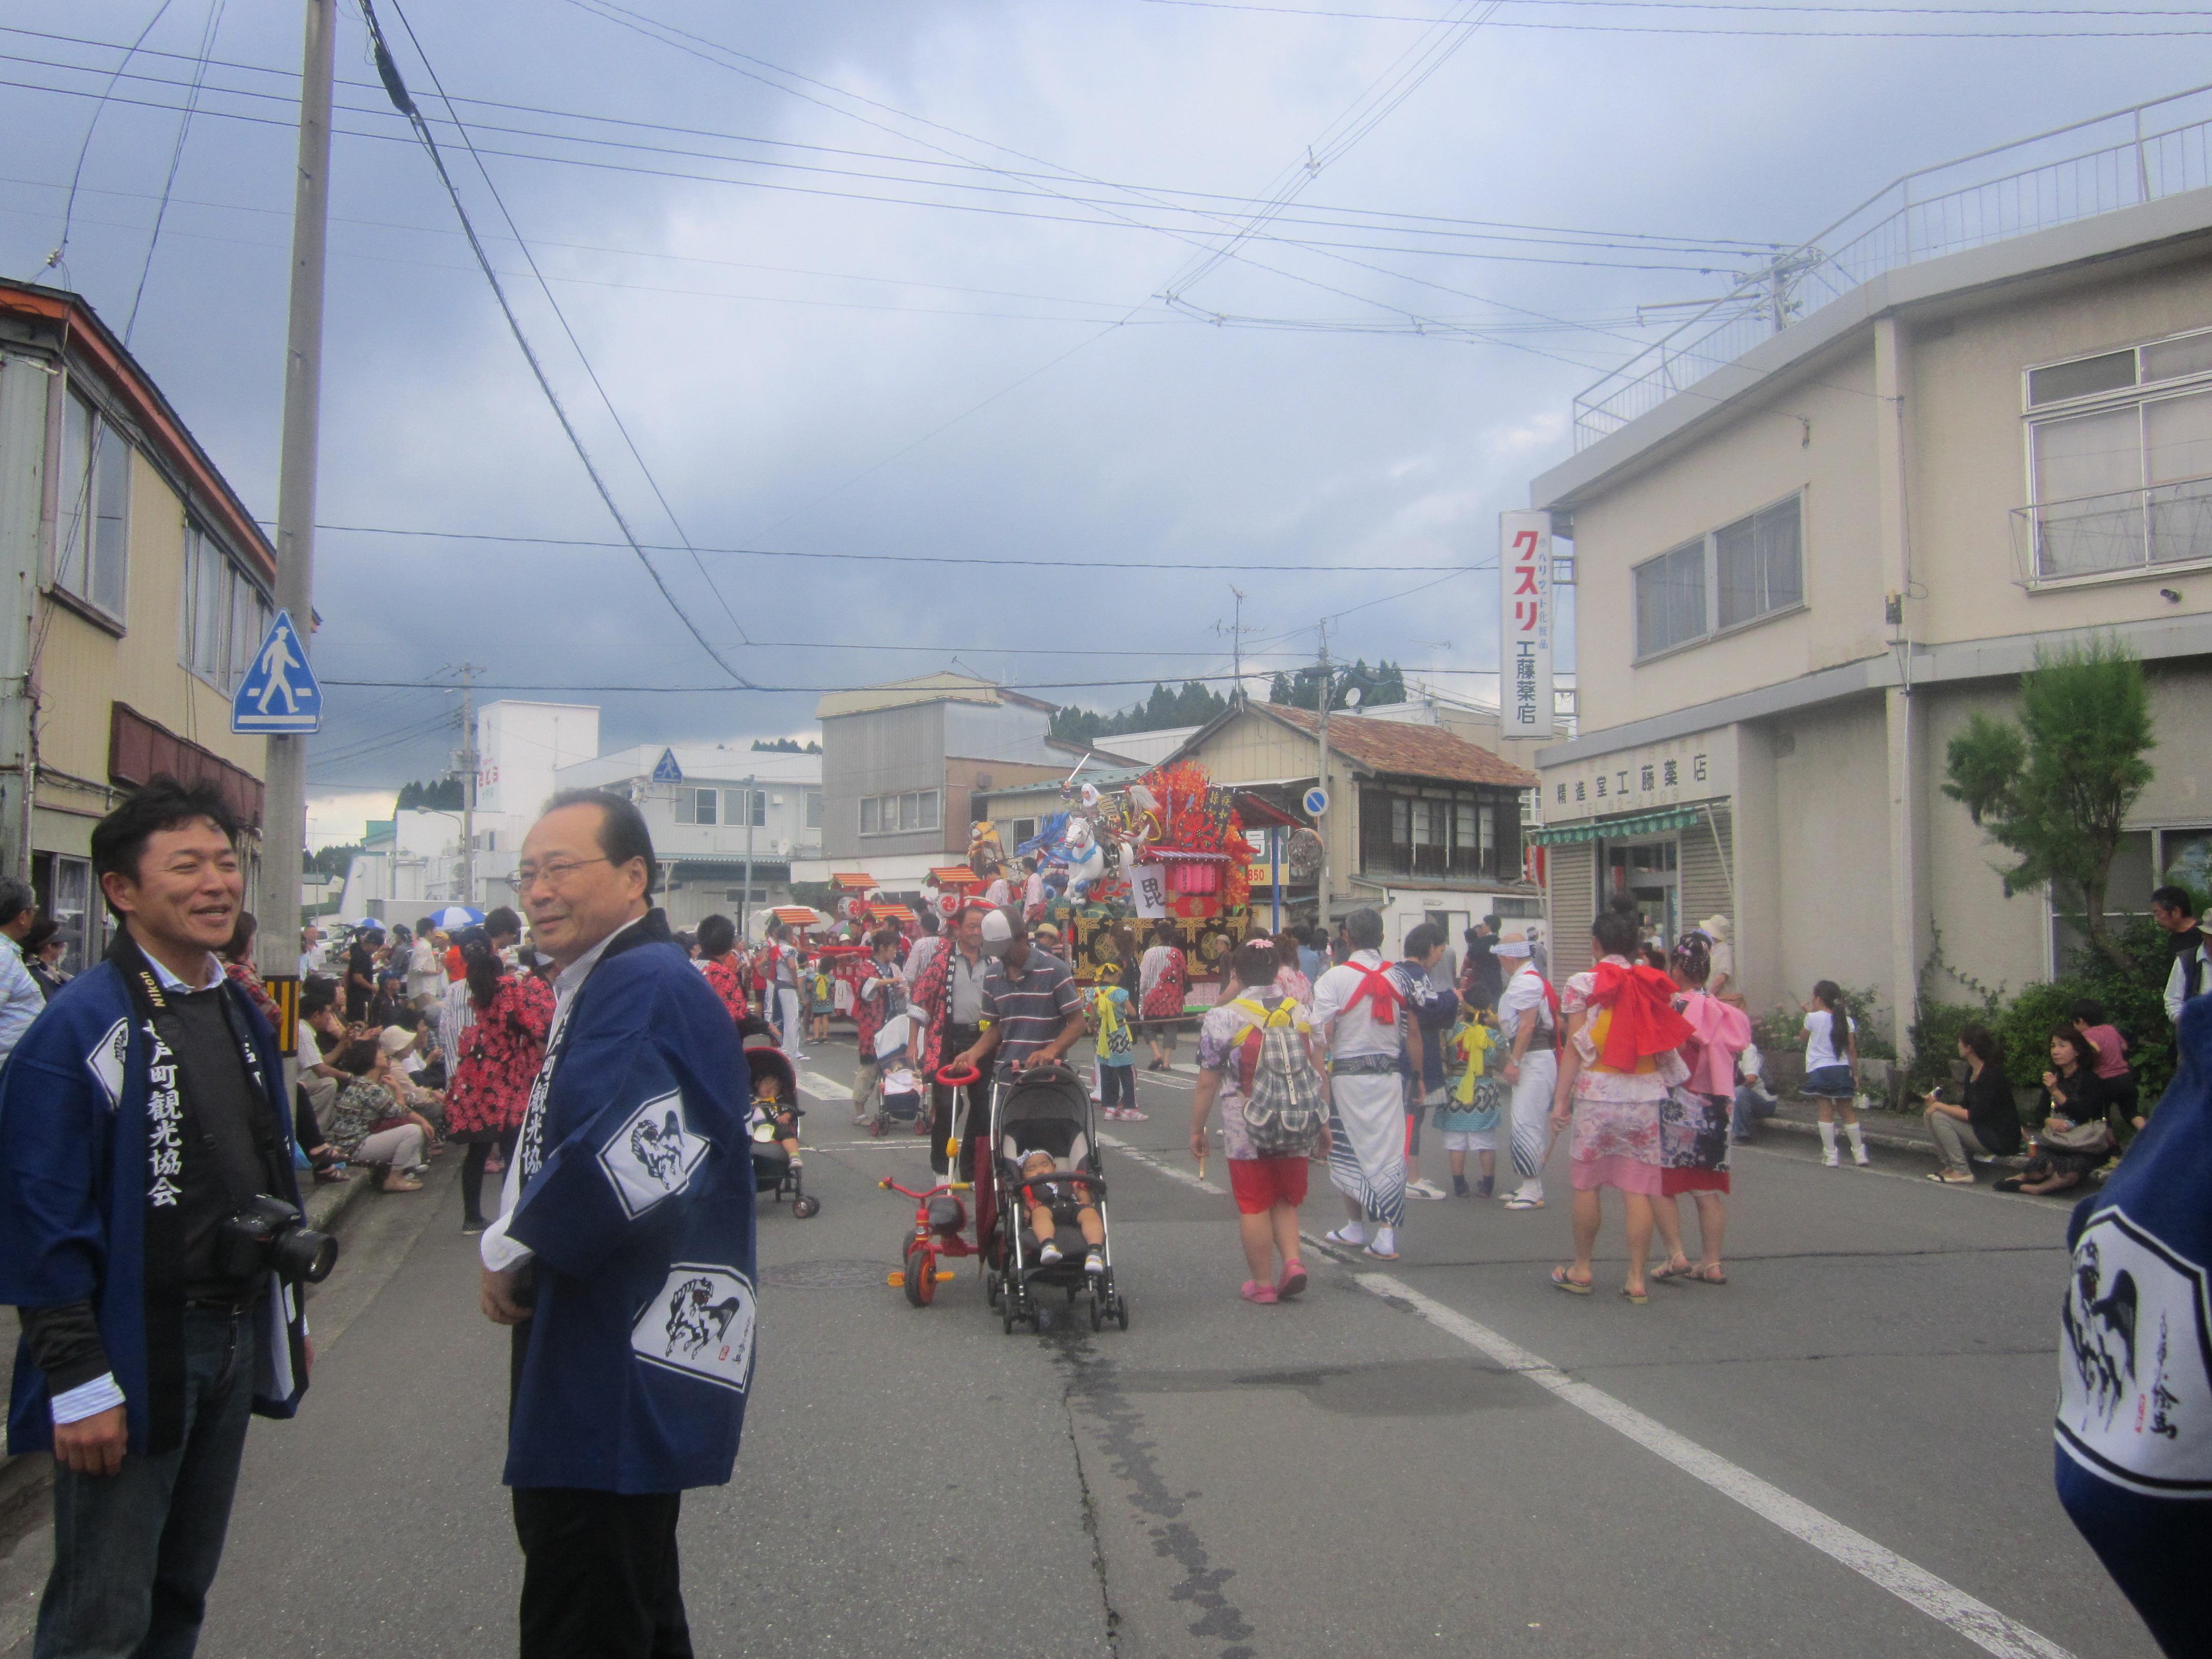 IMG 4256 - 麻布十番納涼祭り25,26日(七戸町出店)